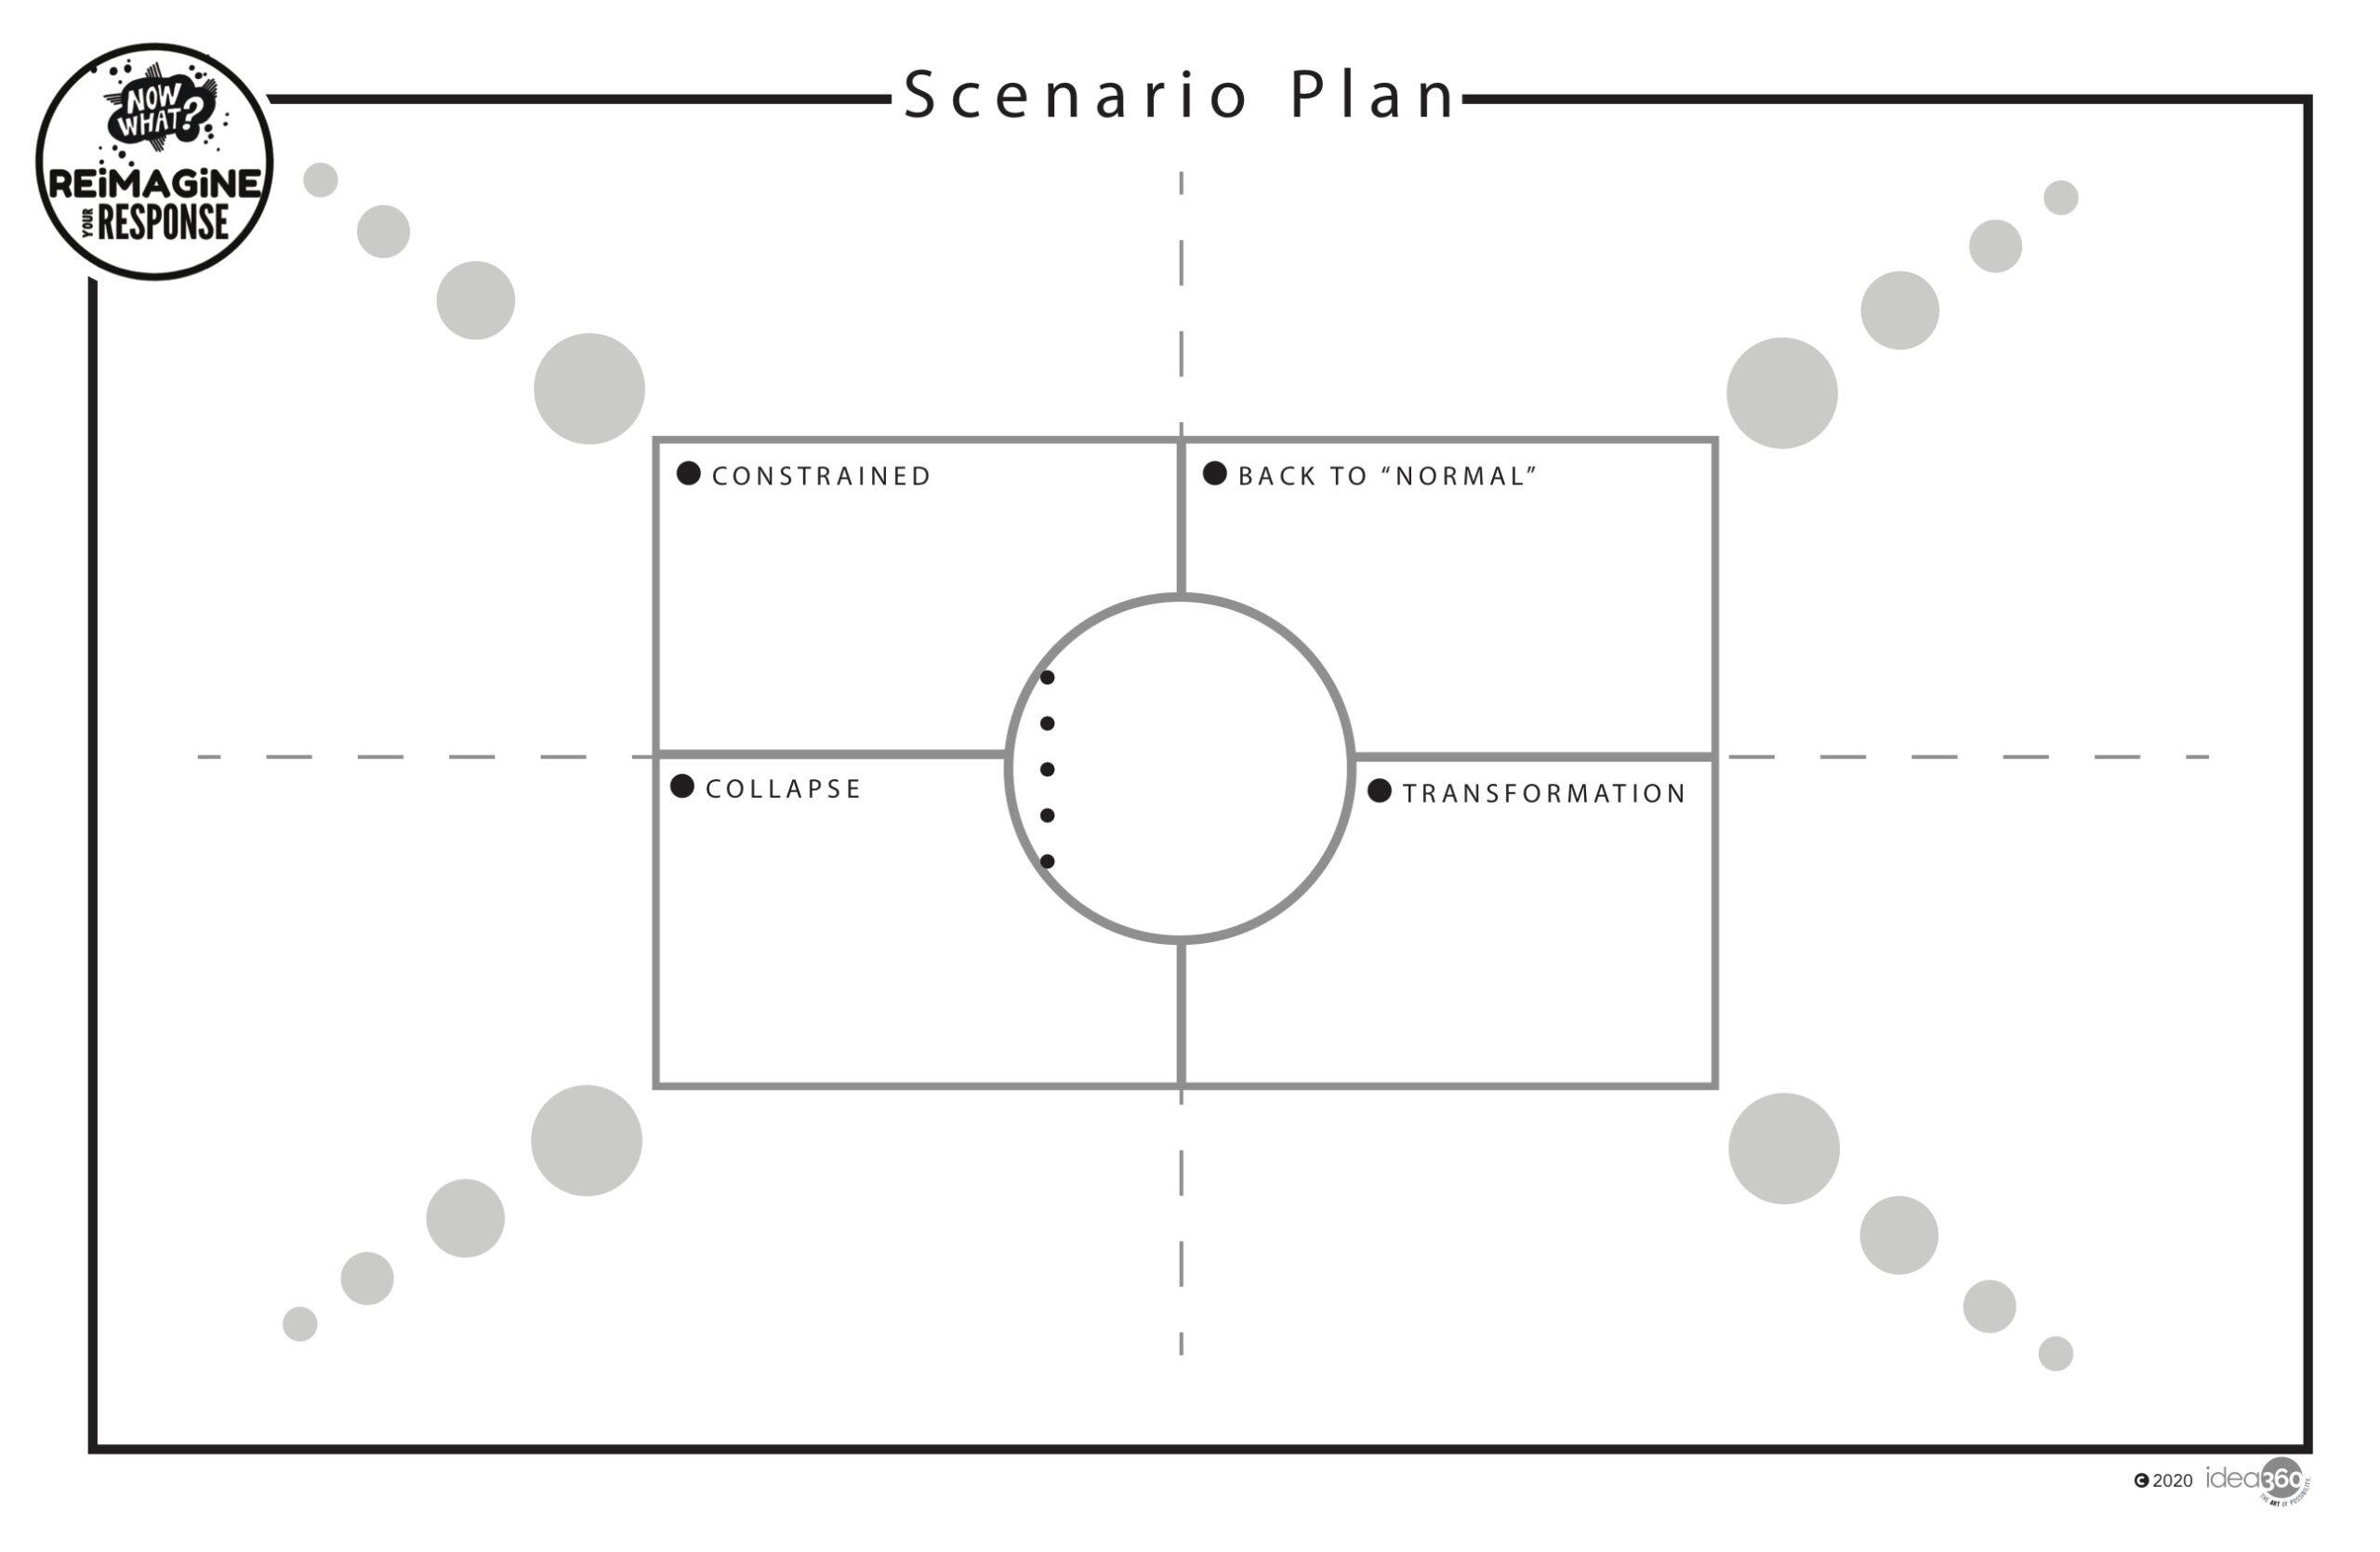 Template Scenario Plan